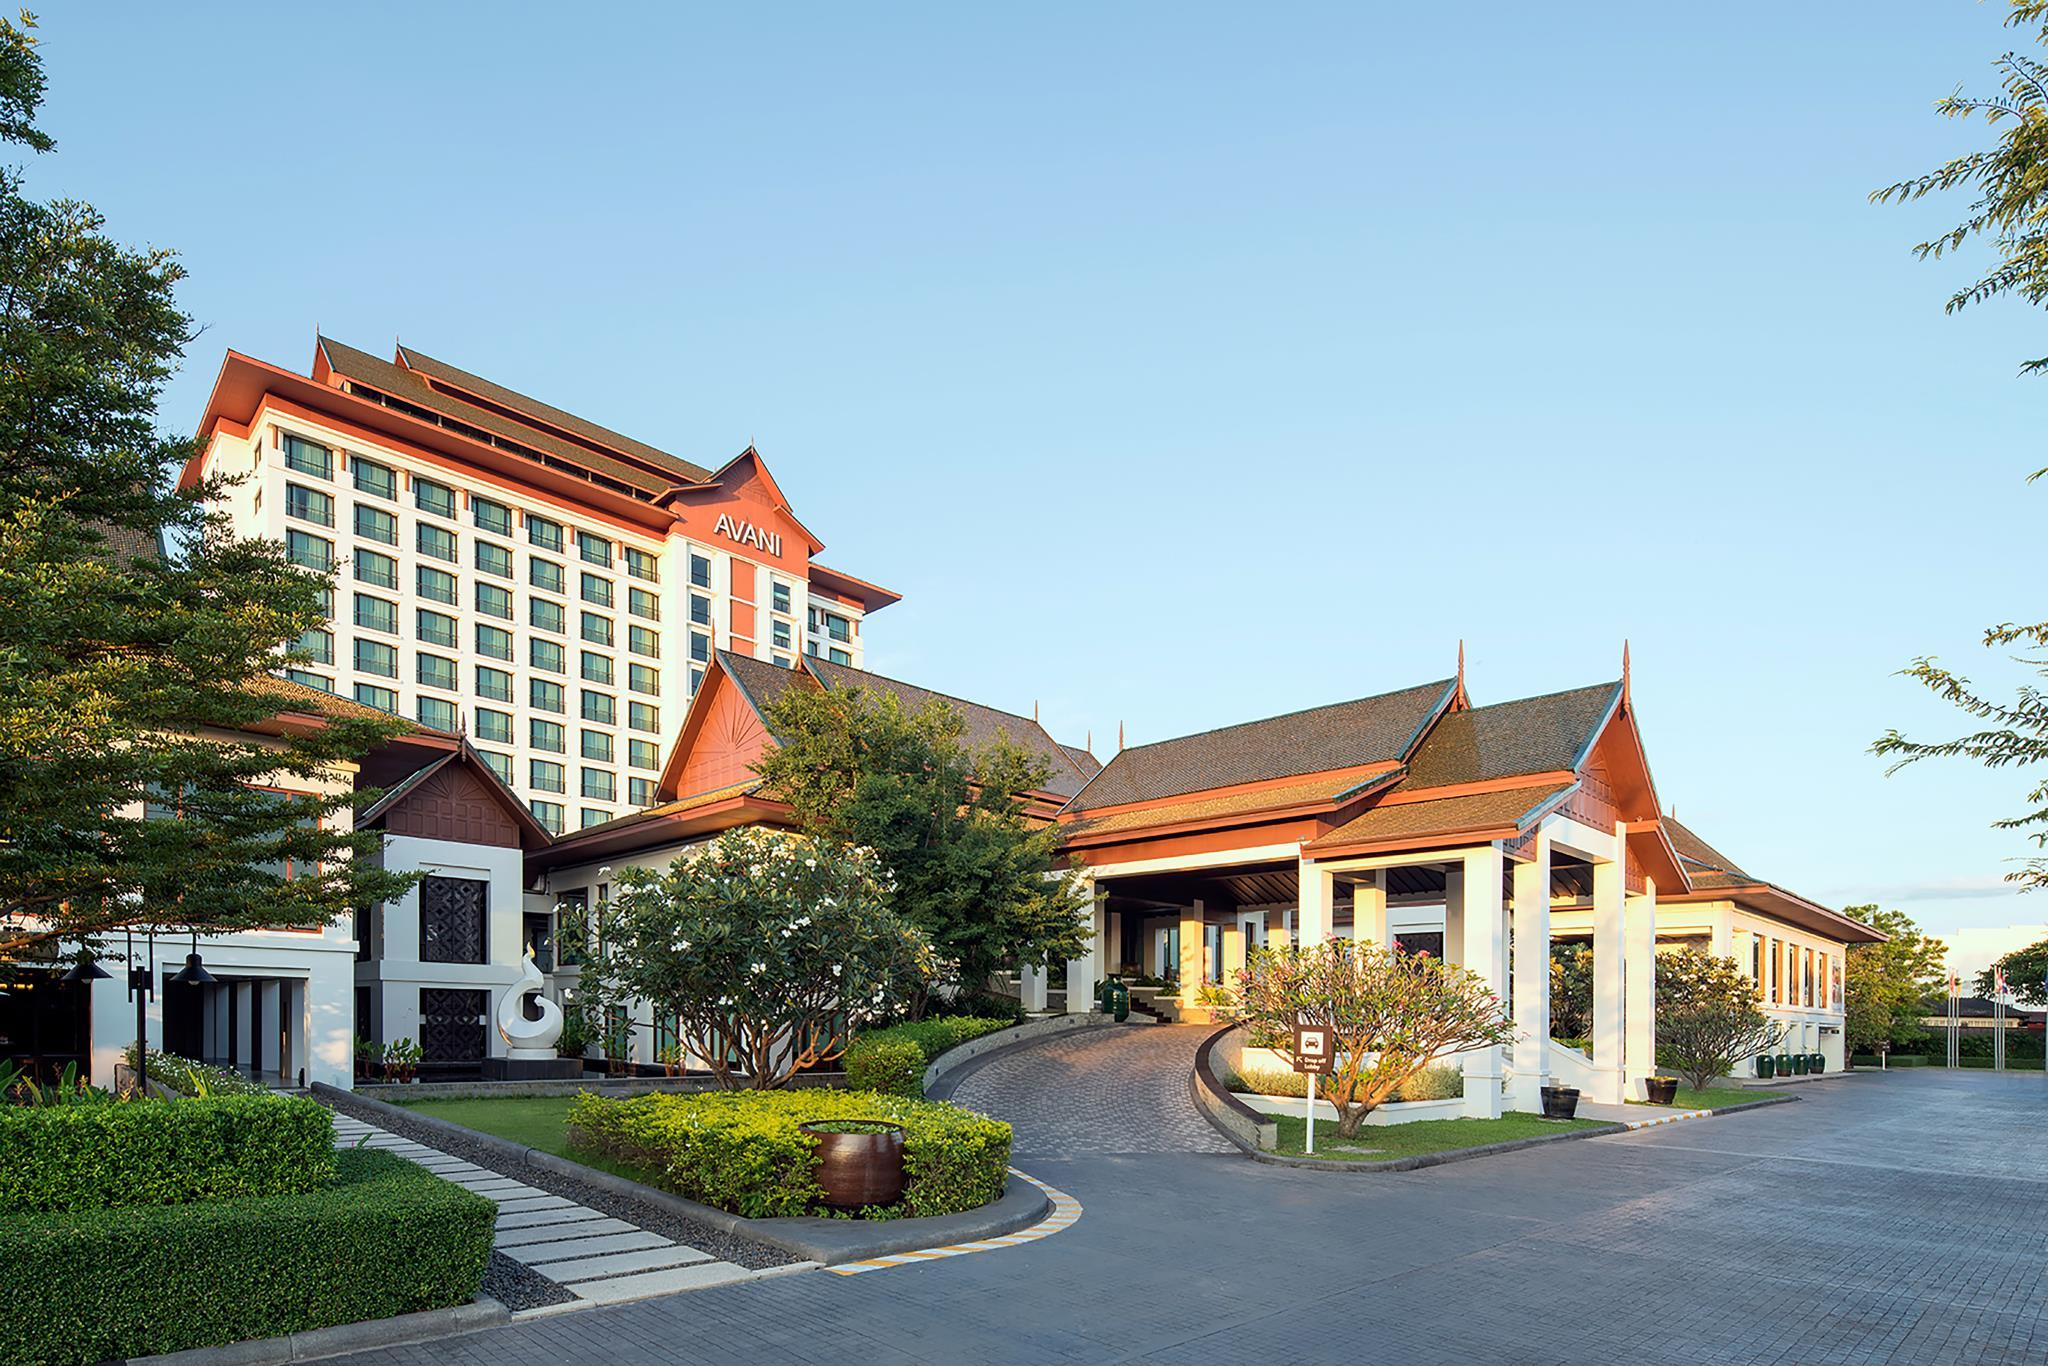 AVANI Khon Kaen Hotel & Convention Centre,โรงแรมเซ็นทารา แอนด์ คอนเวนชั่น เซนเตอร์ ขอนแก่น